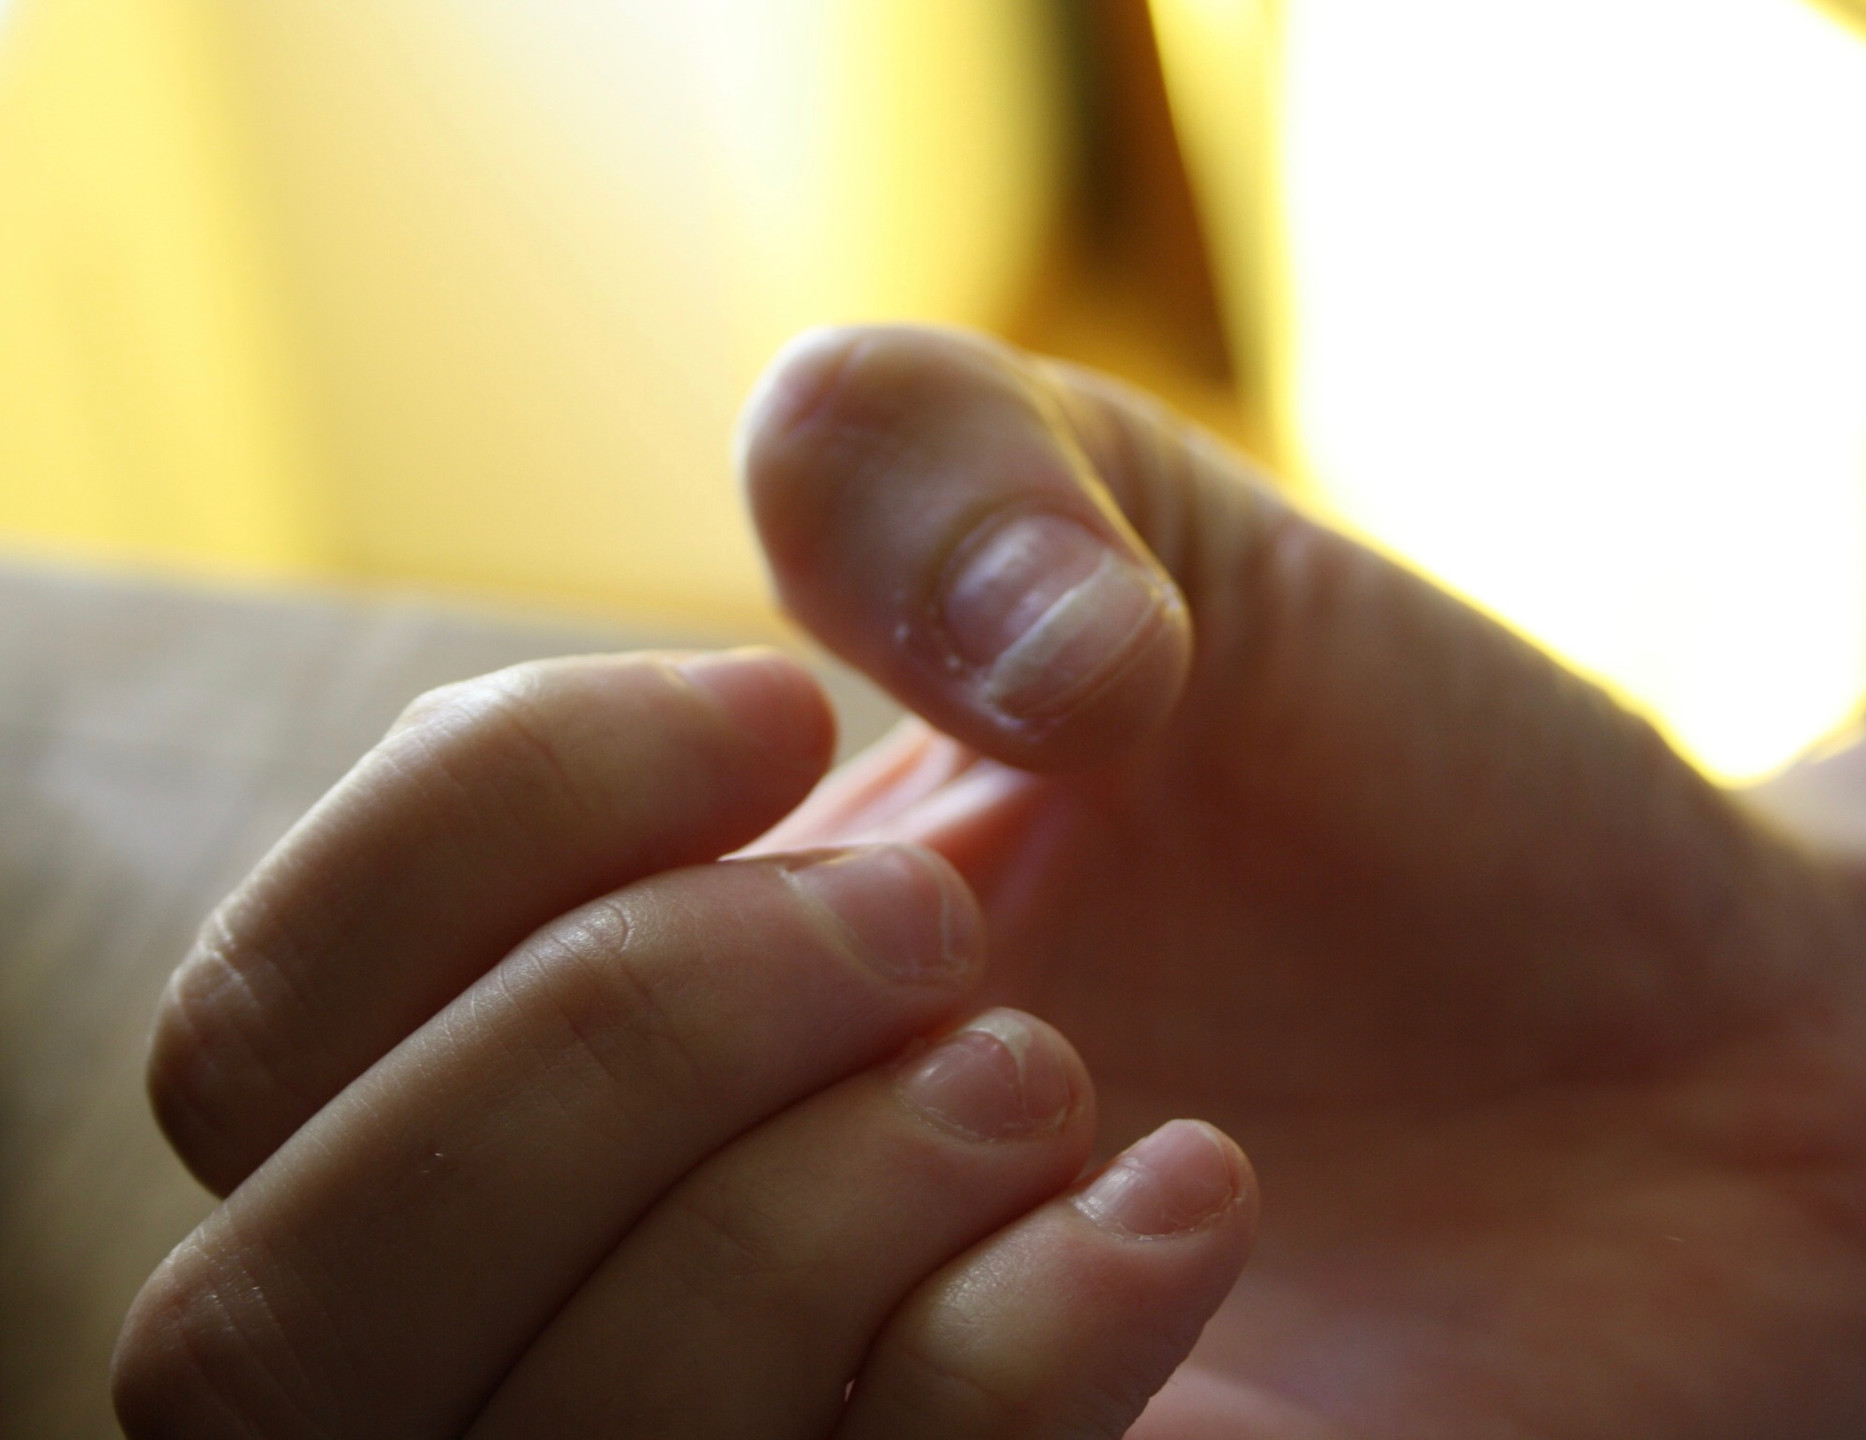 Mes ongles 3 mois après l'hospitalisation